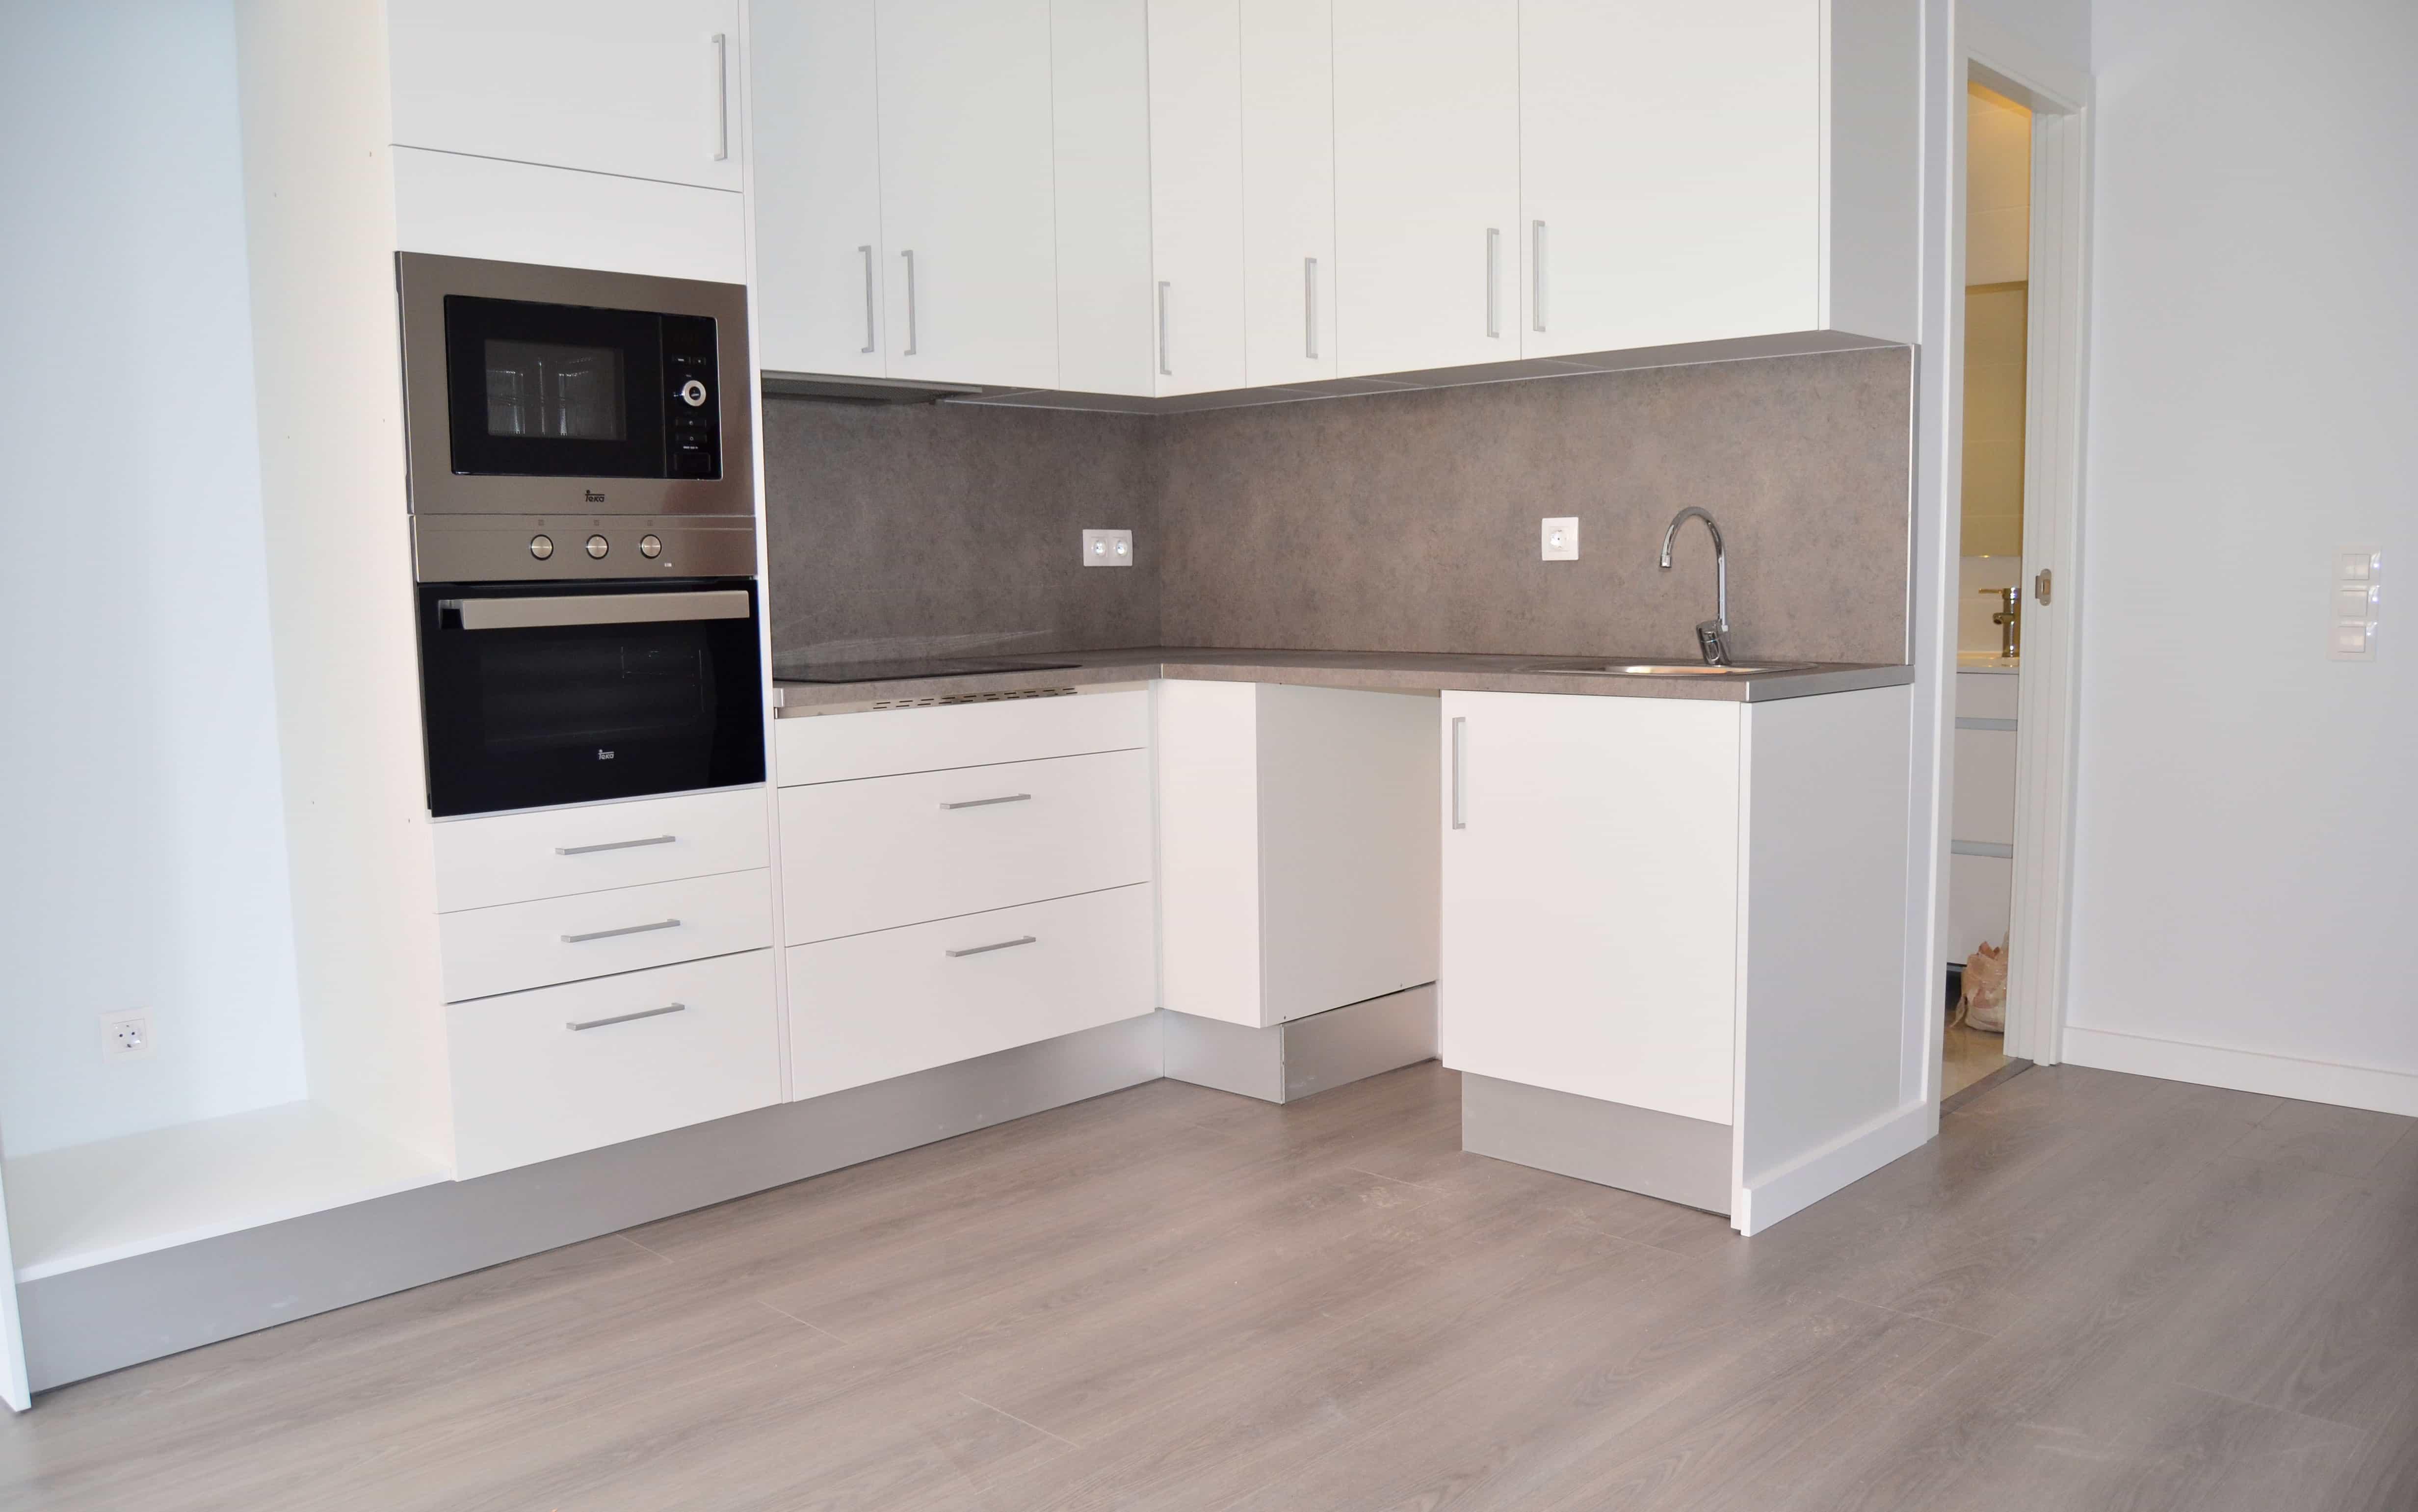 Cocina abierta piso Gifré Contract Solutions